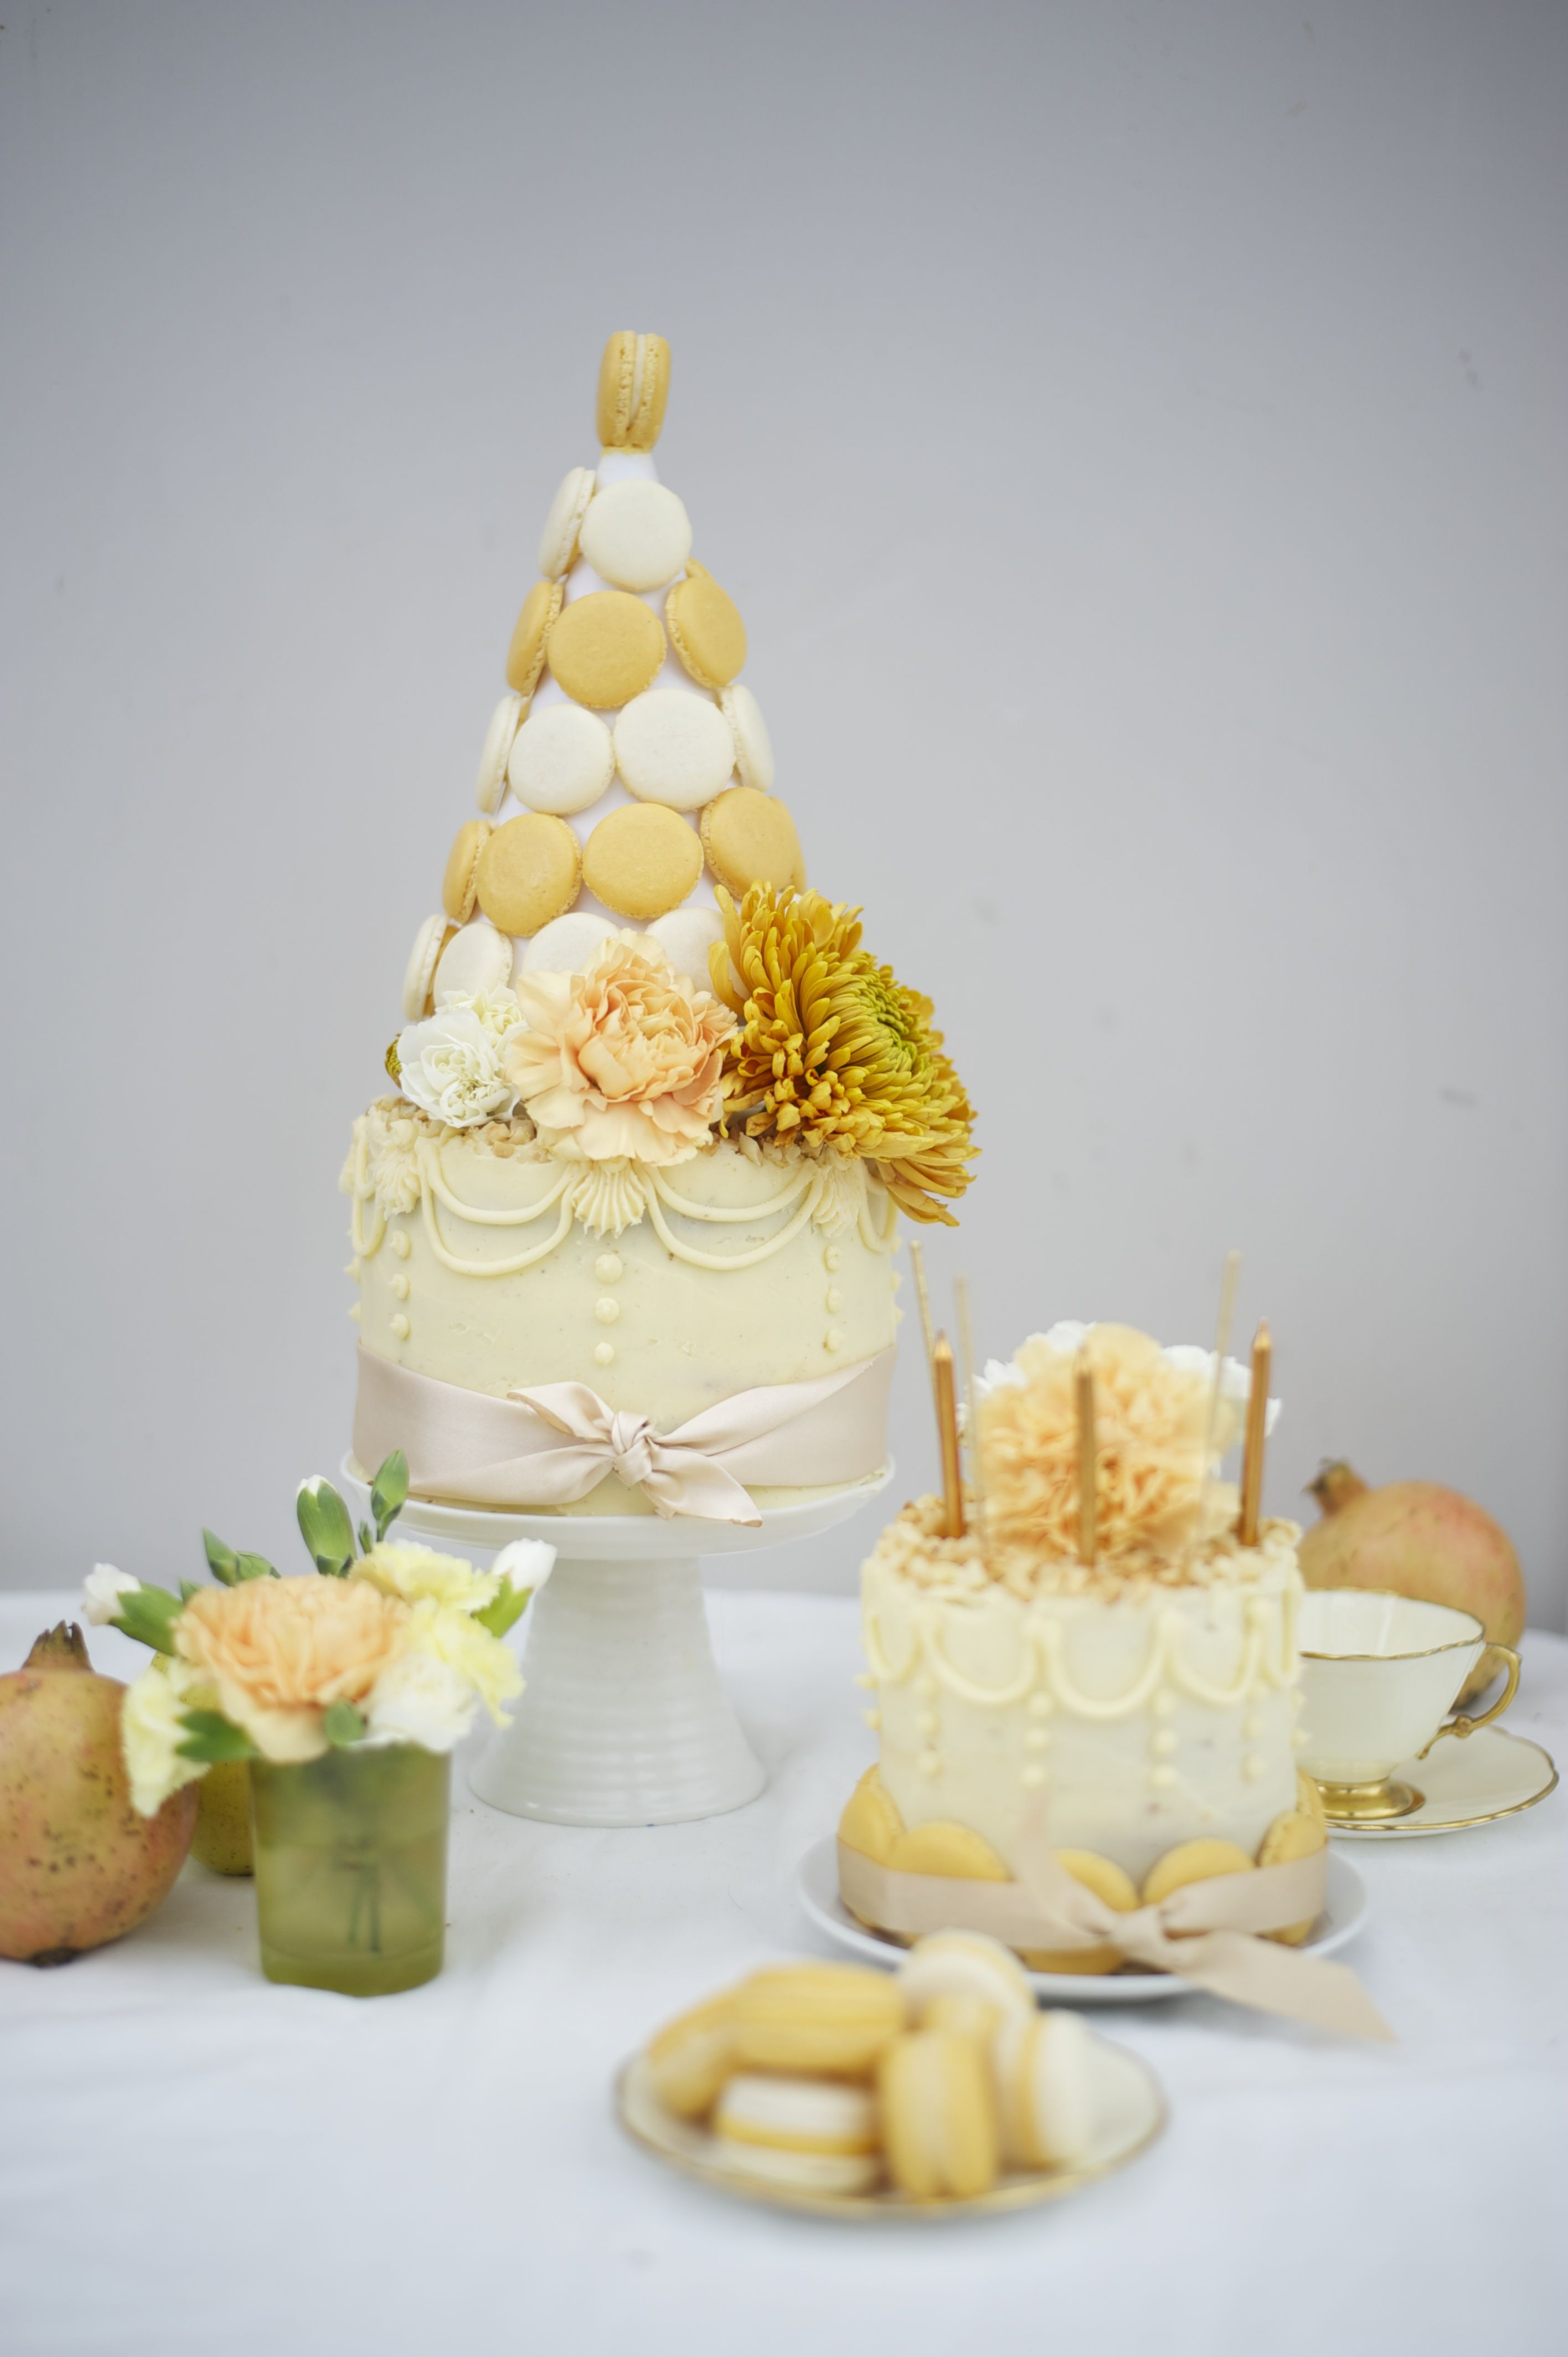 White Chocolate, Ginger and Macadamia Nut Macaron Cake